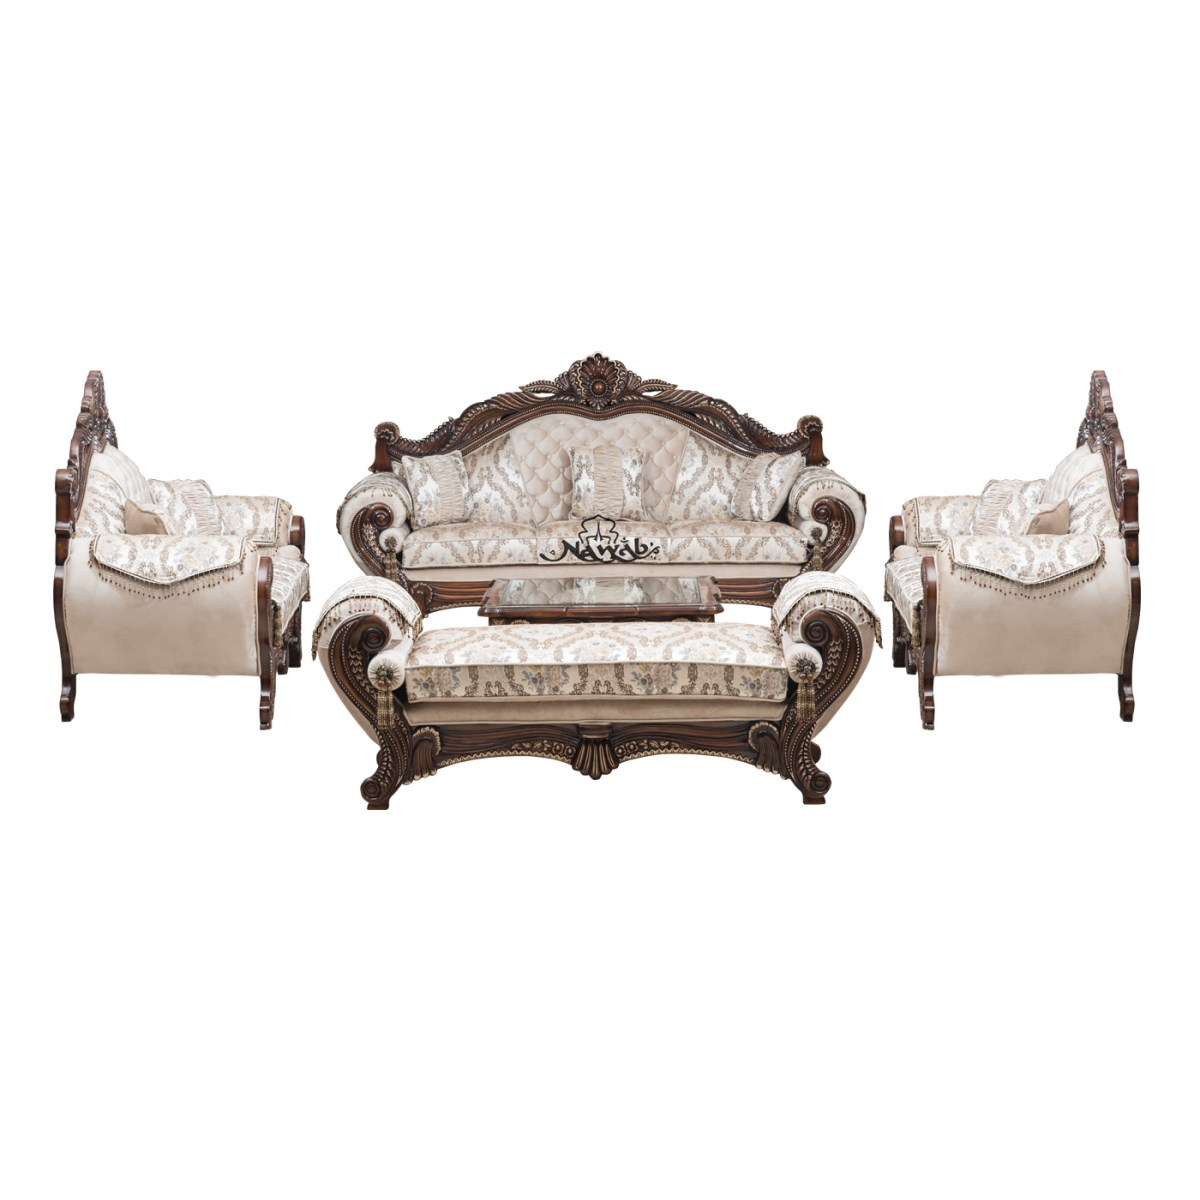 wallnut-pu-polish-solid-wooden-teak-with-carving-velvet-pattern-fabric-set